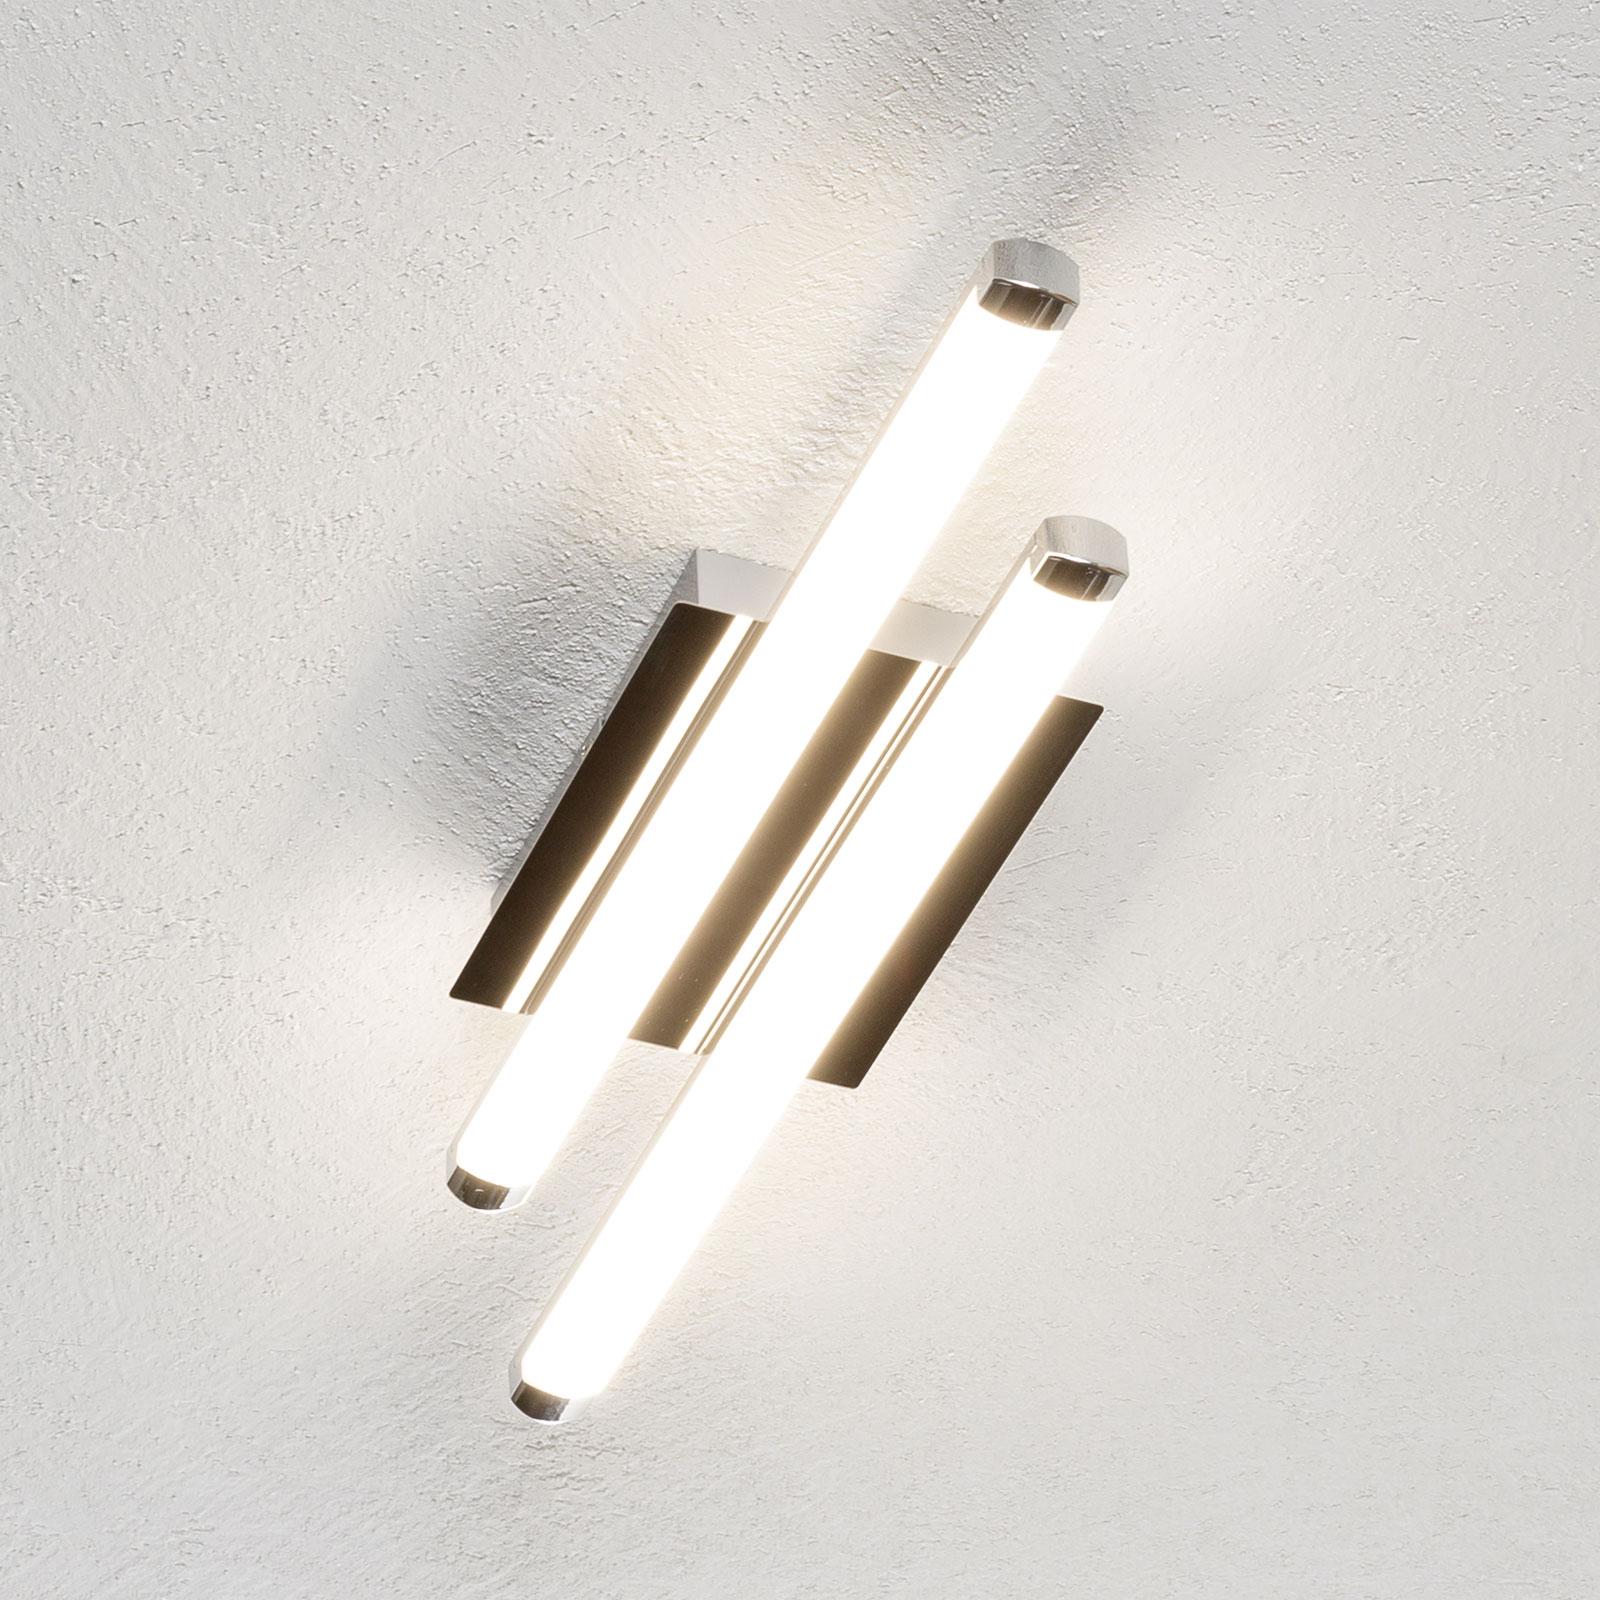 Futurystyczna lampa sufitowa LED Street